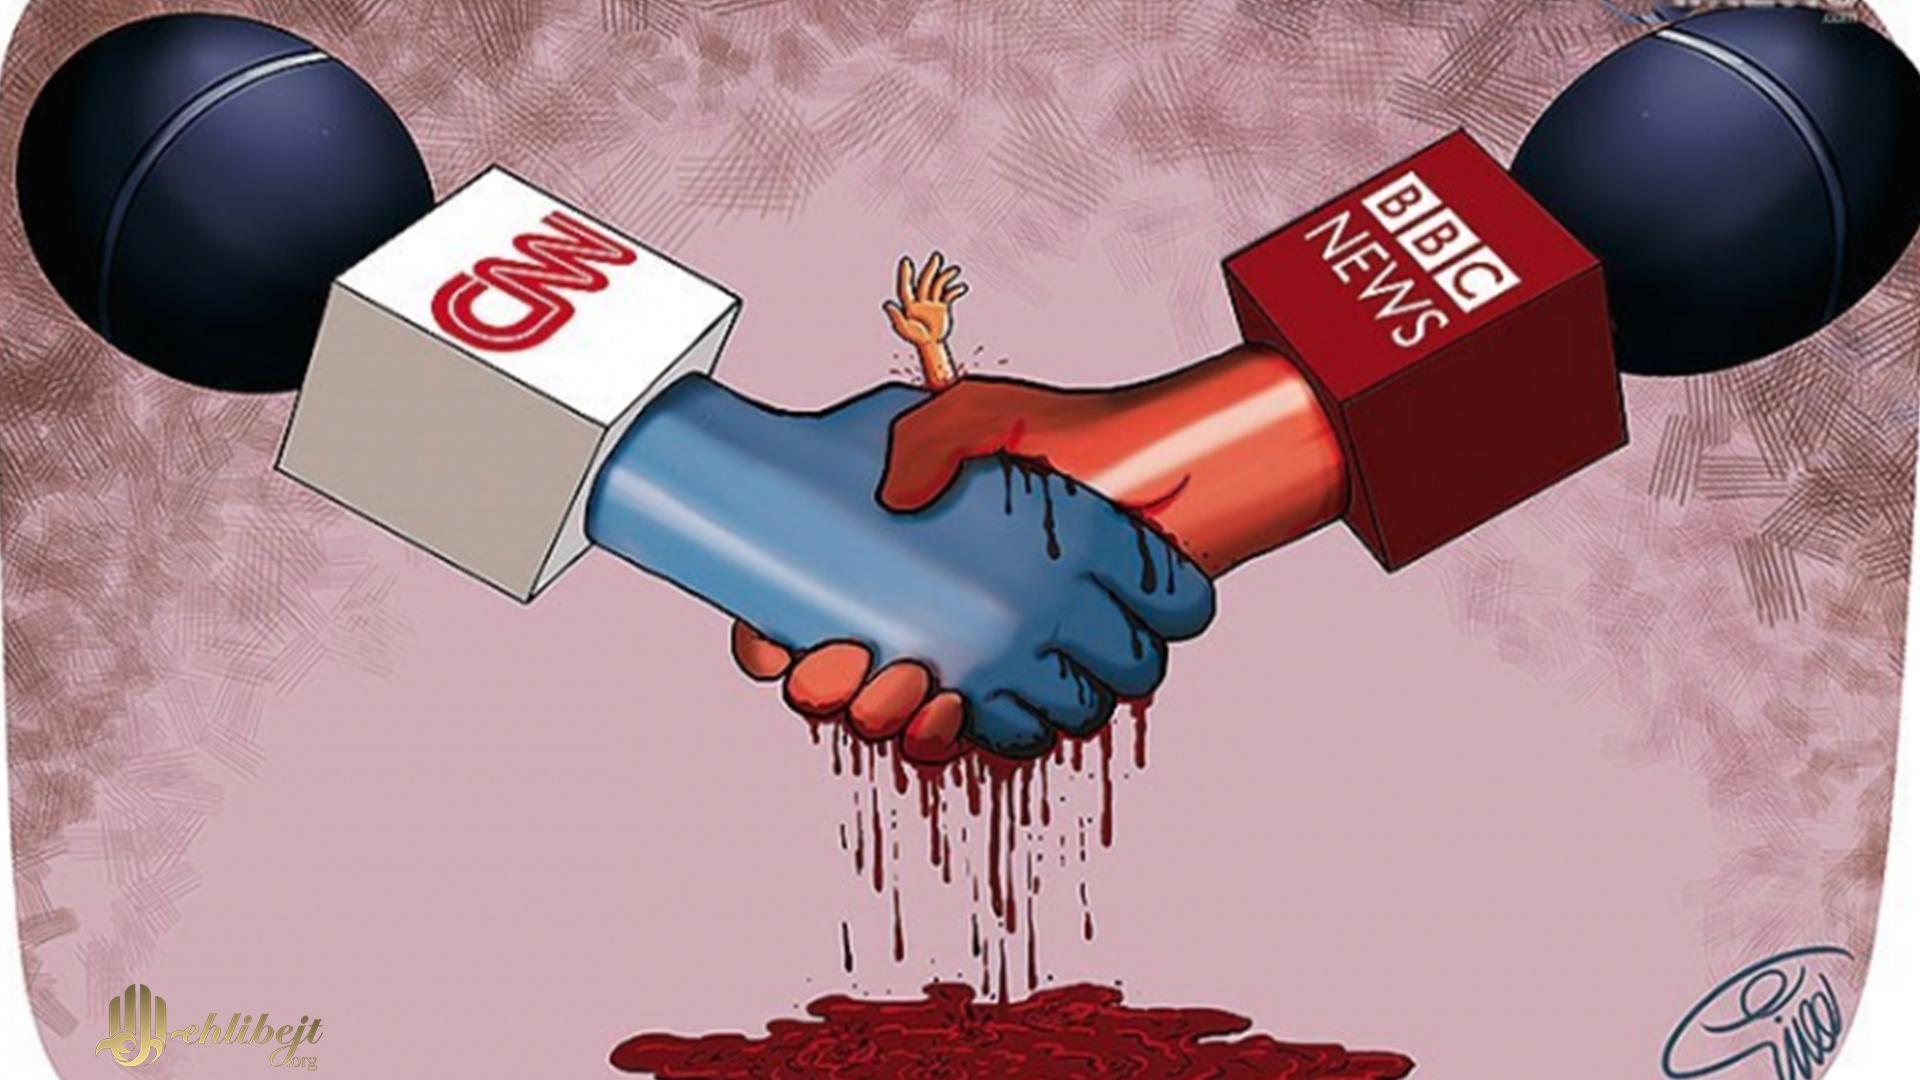 Zapadni mediji i terorizam – dvostruki aršini i manipulacija